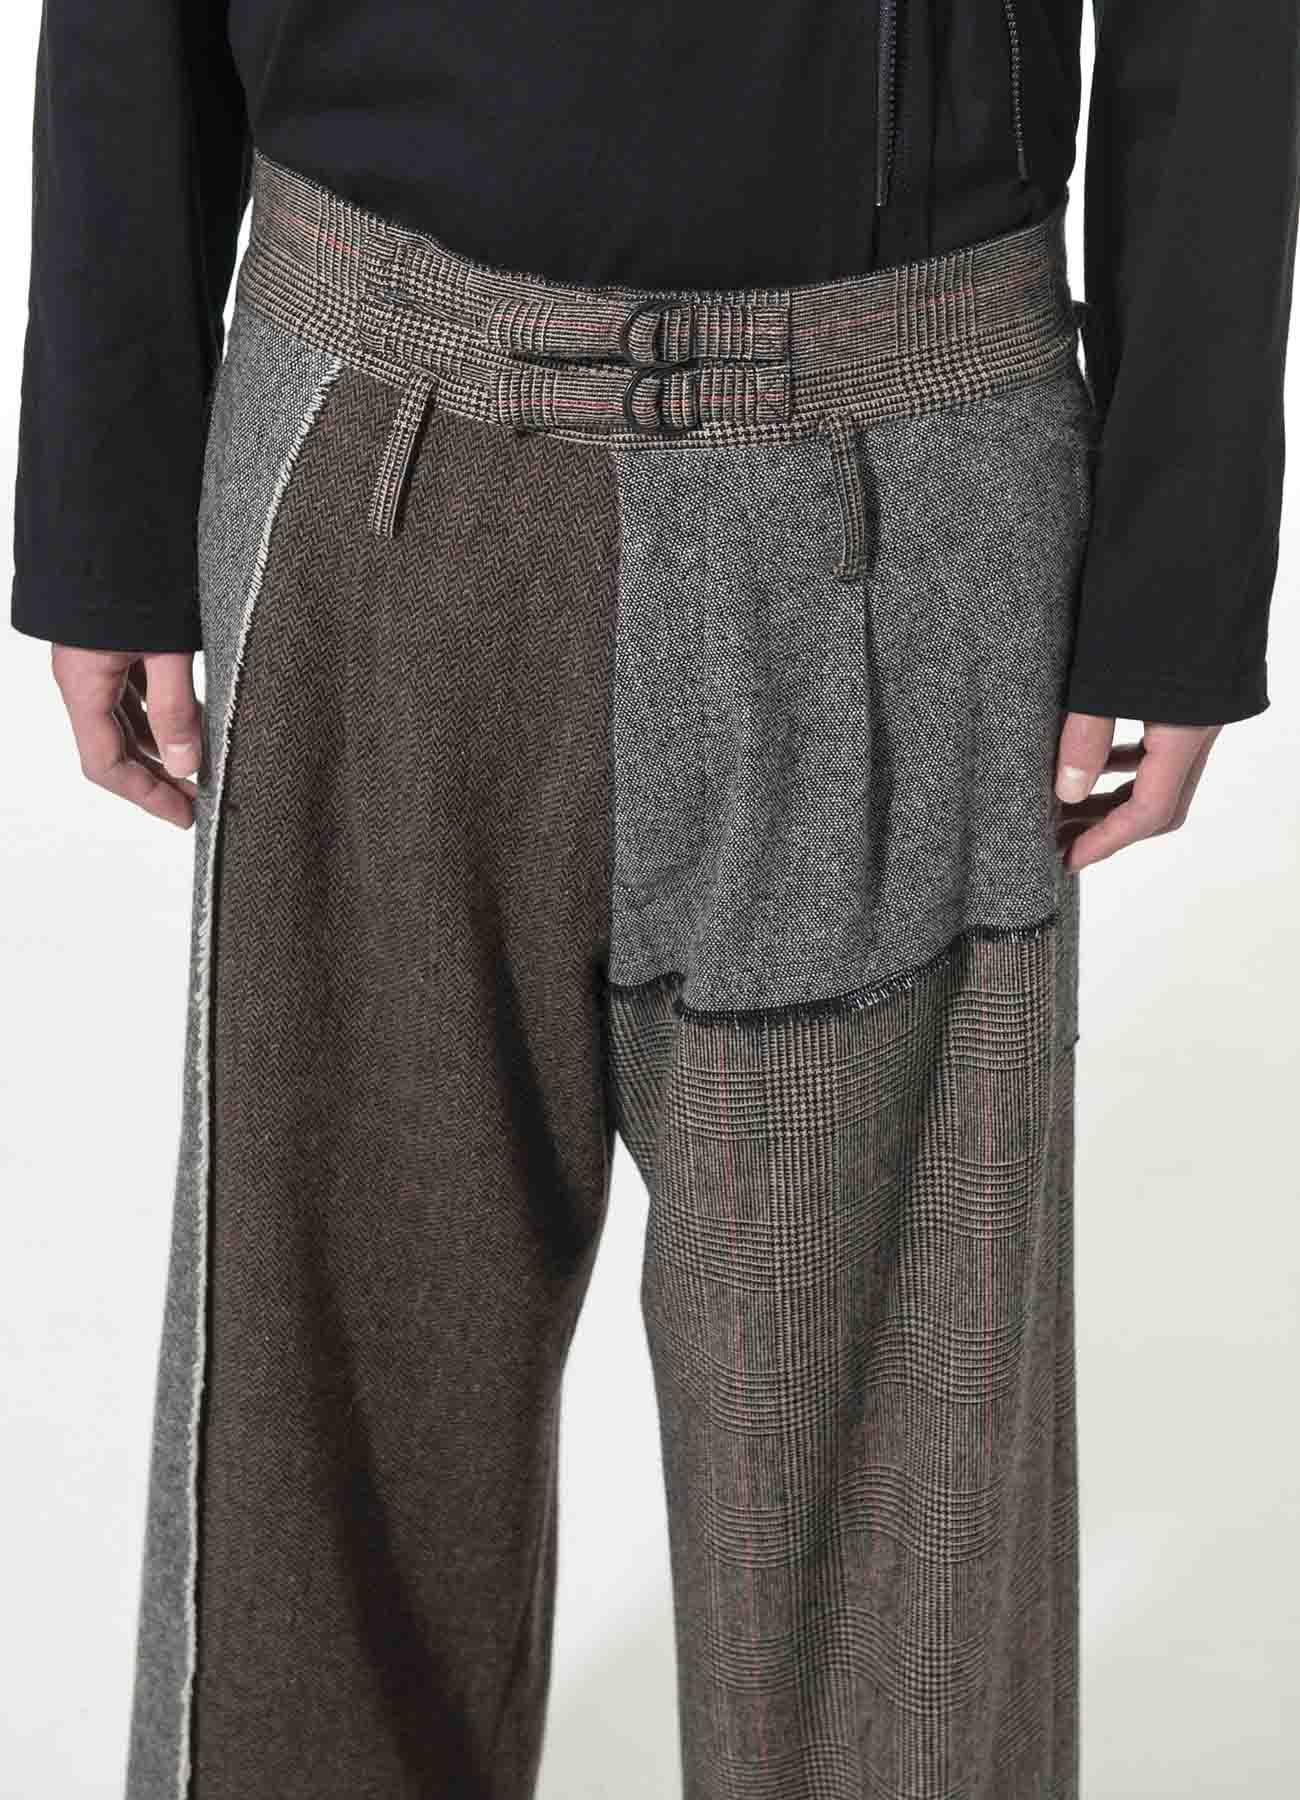 Crazy tweed One Tuck Waist Adjust Buggy Pants